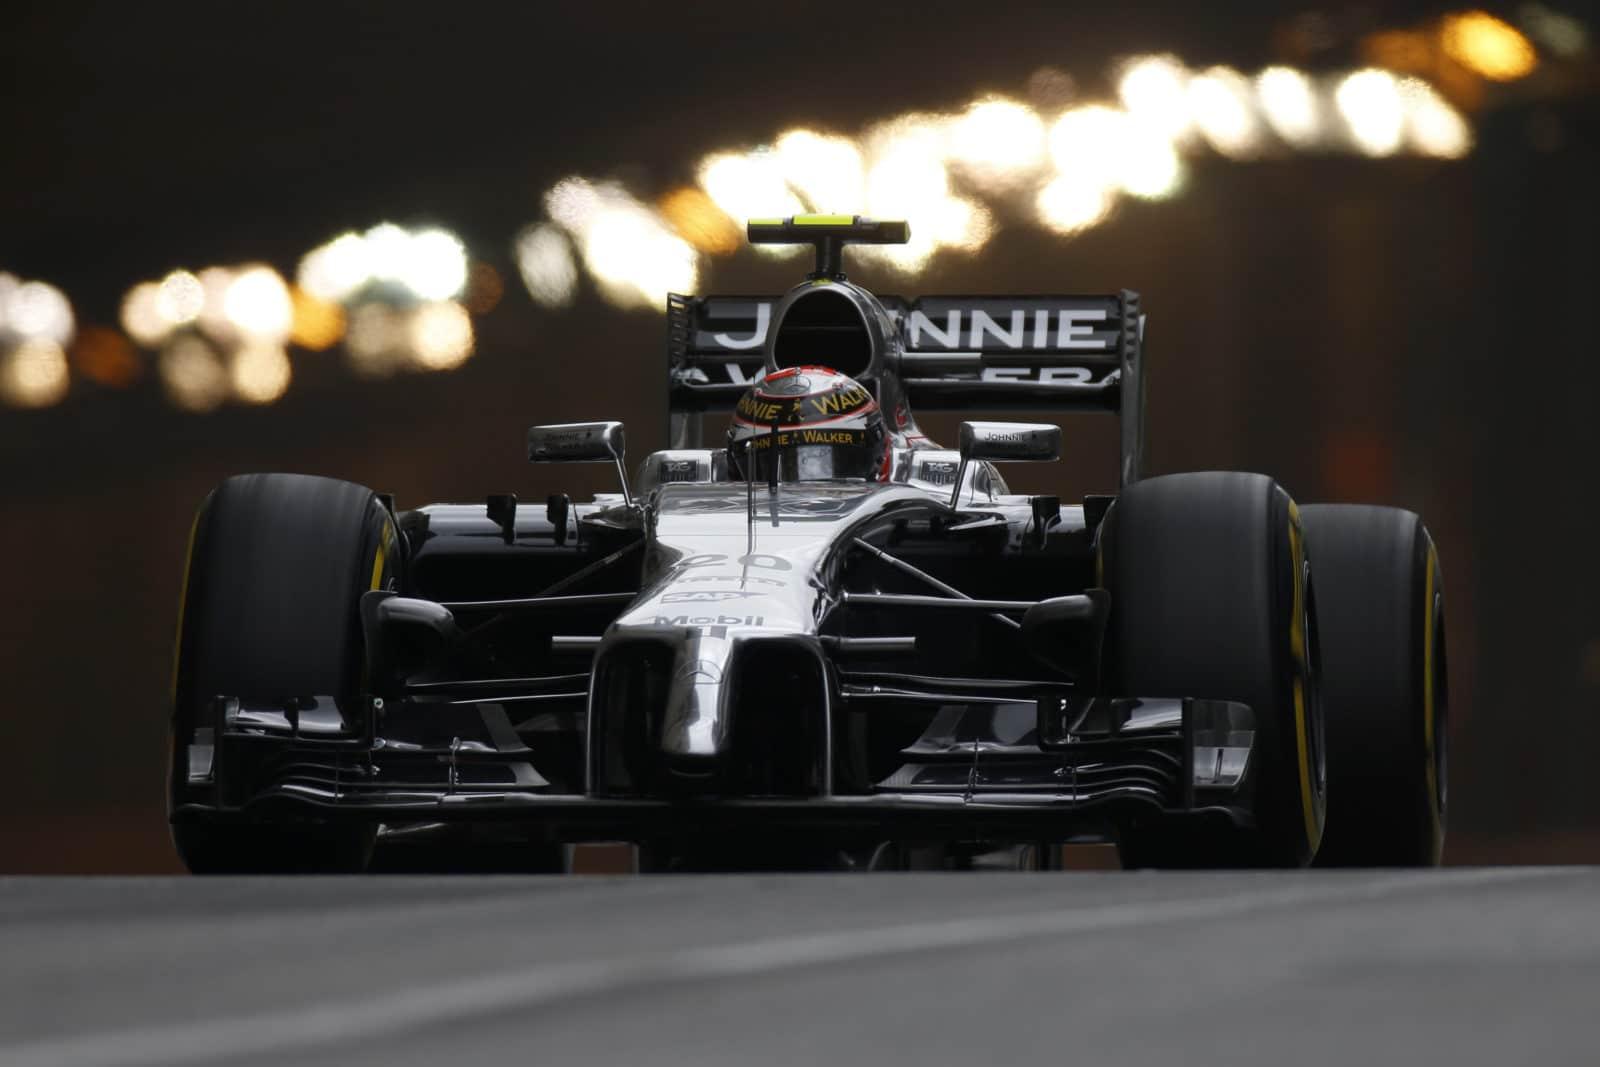 Kevin Magnussen, Monaco, practise, 2014 Foto: McLaren